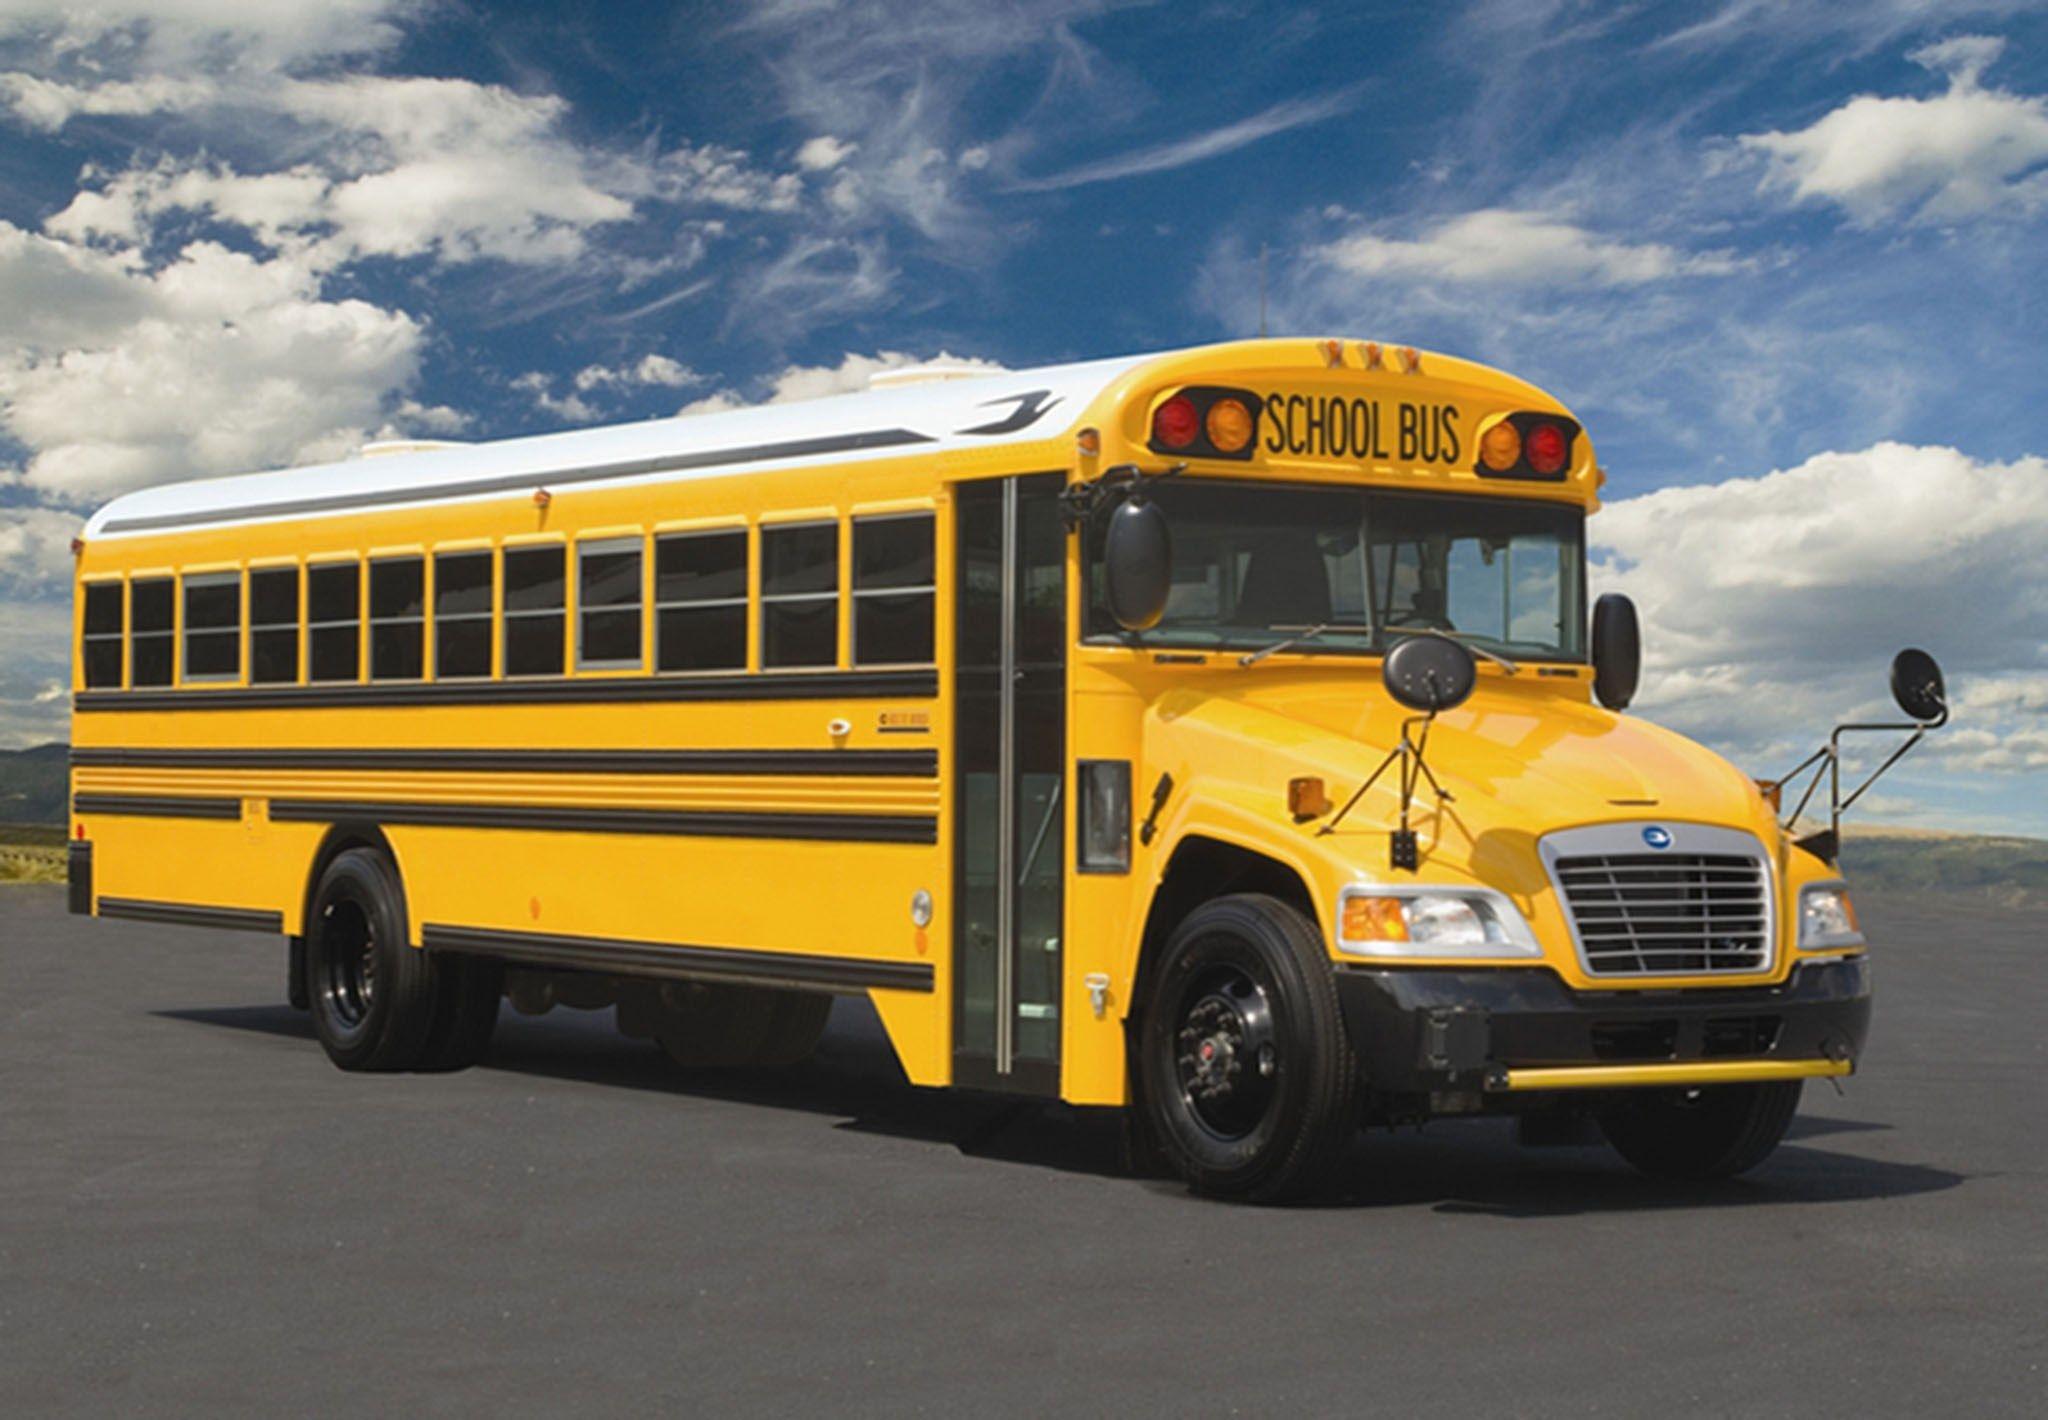 School Bus Wallpaper School Bus Yellow School Bus Bus